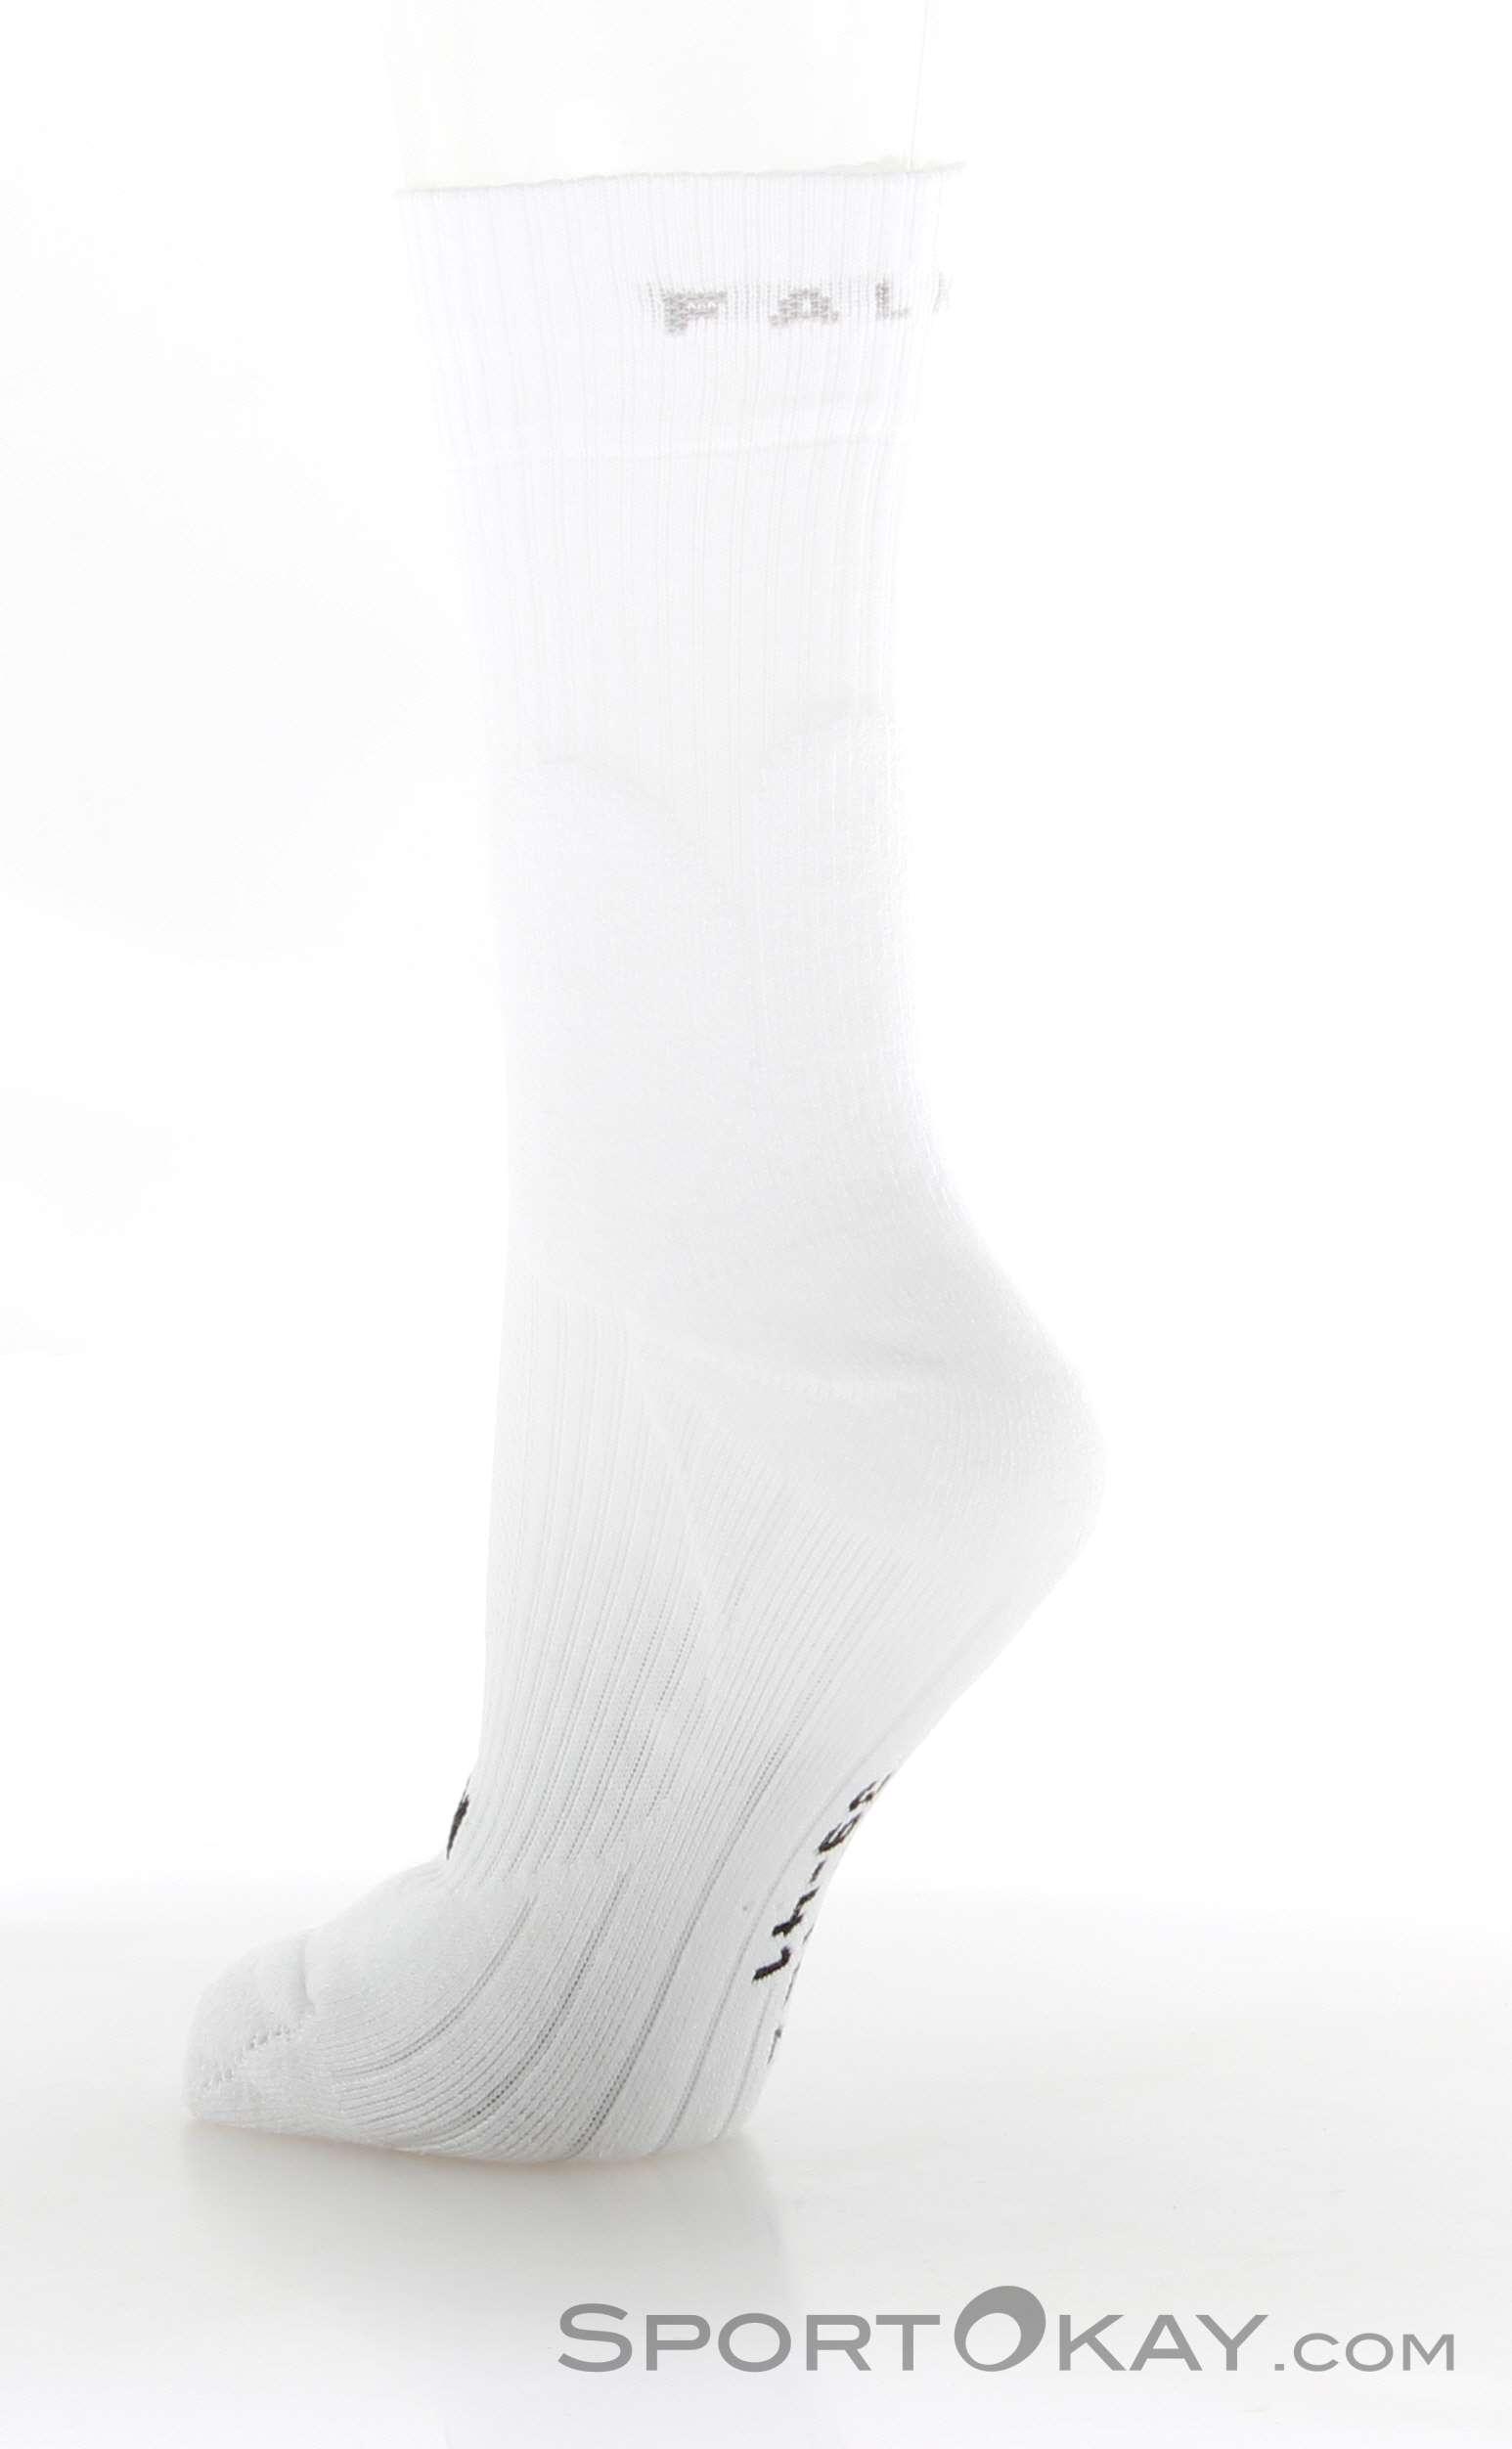 Falke Sneaker Socken: 144 Produkte im Angebot | Stylight